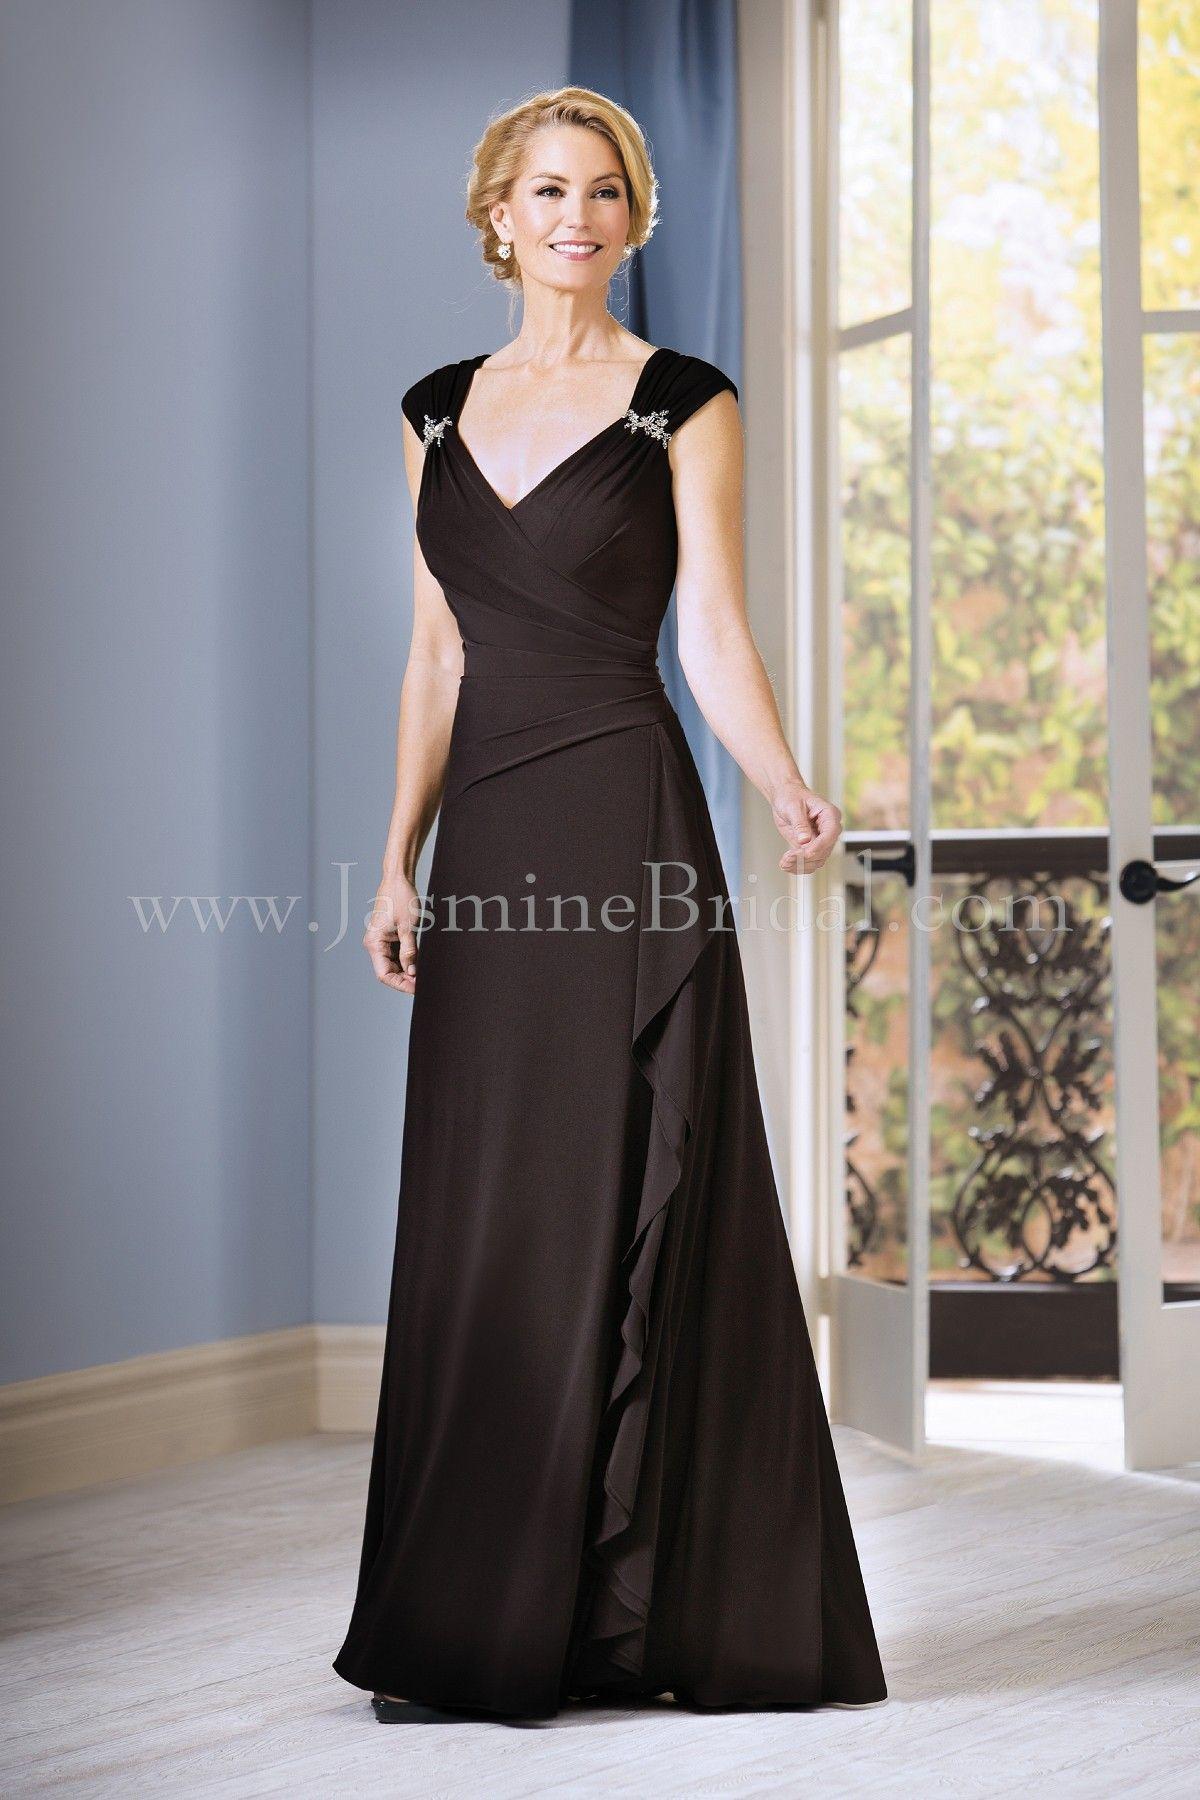 Jasmine bridal jade style j185056 in black fall 2016 mother of jasmine bridal jade style j185056 in black evening dresses onlinedress ombrellifo Images